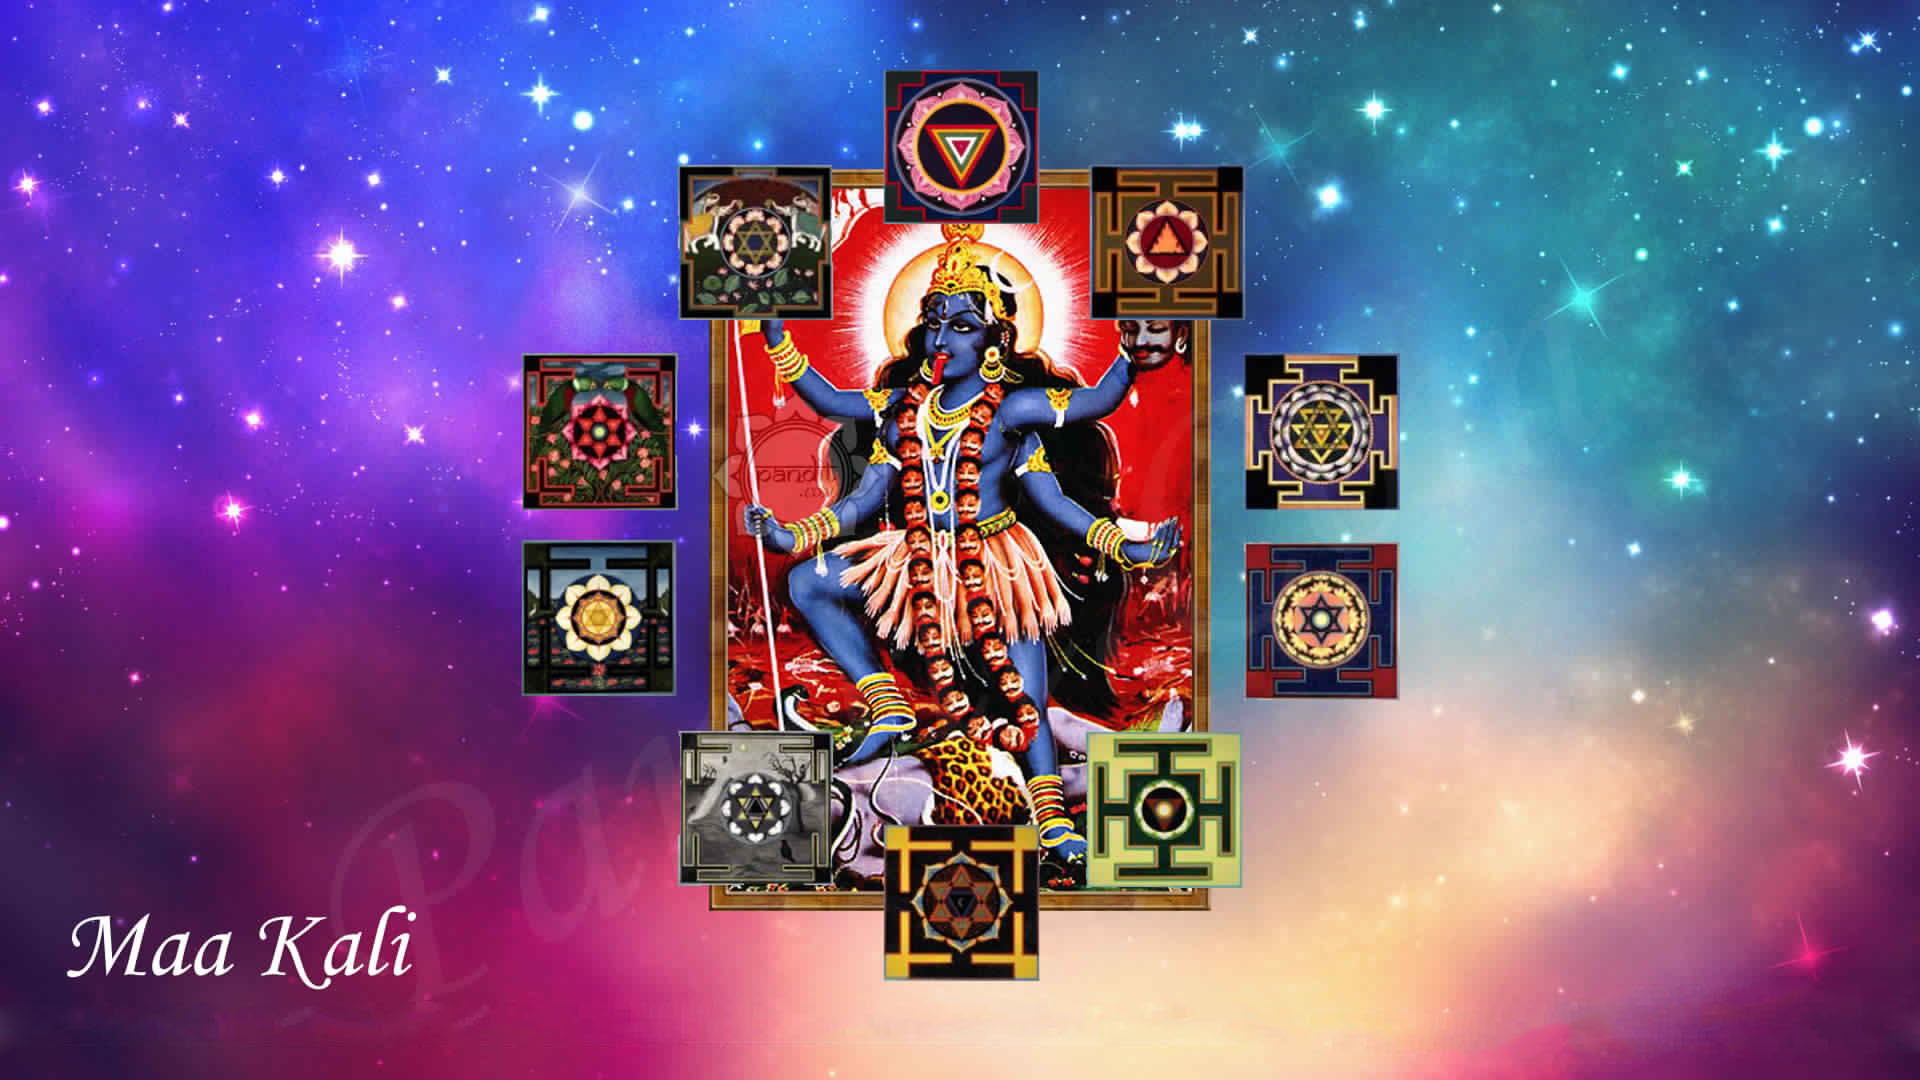 Maa Kali Wallpaper Download